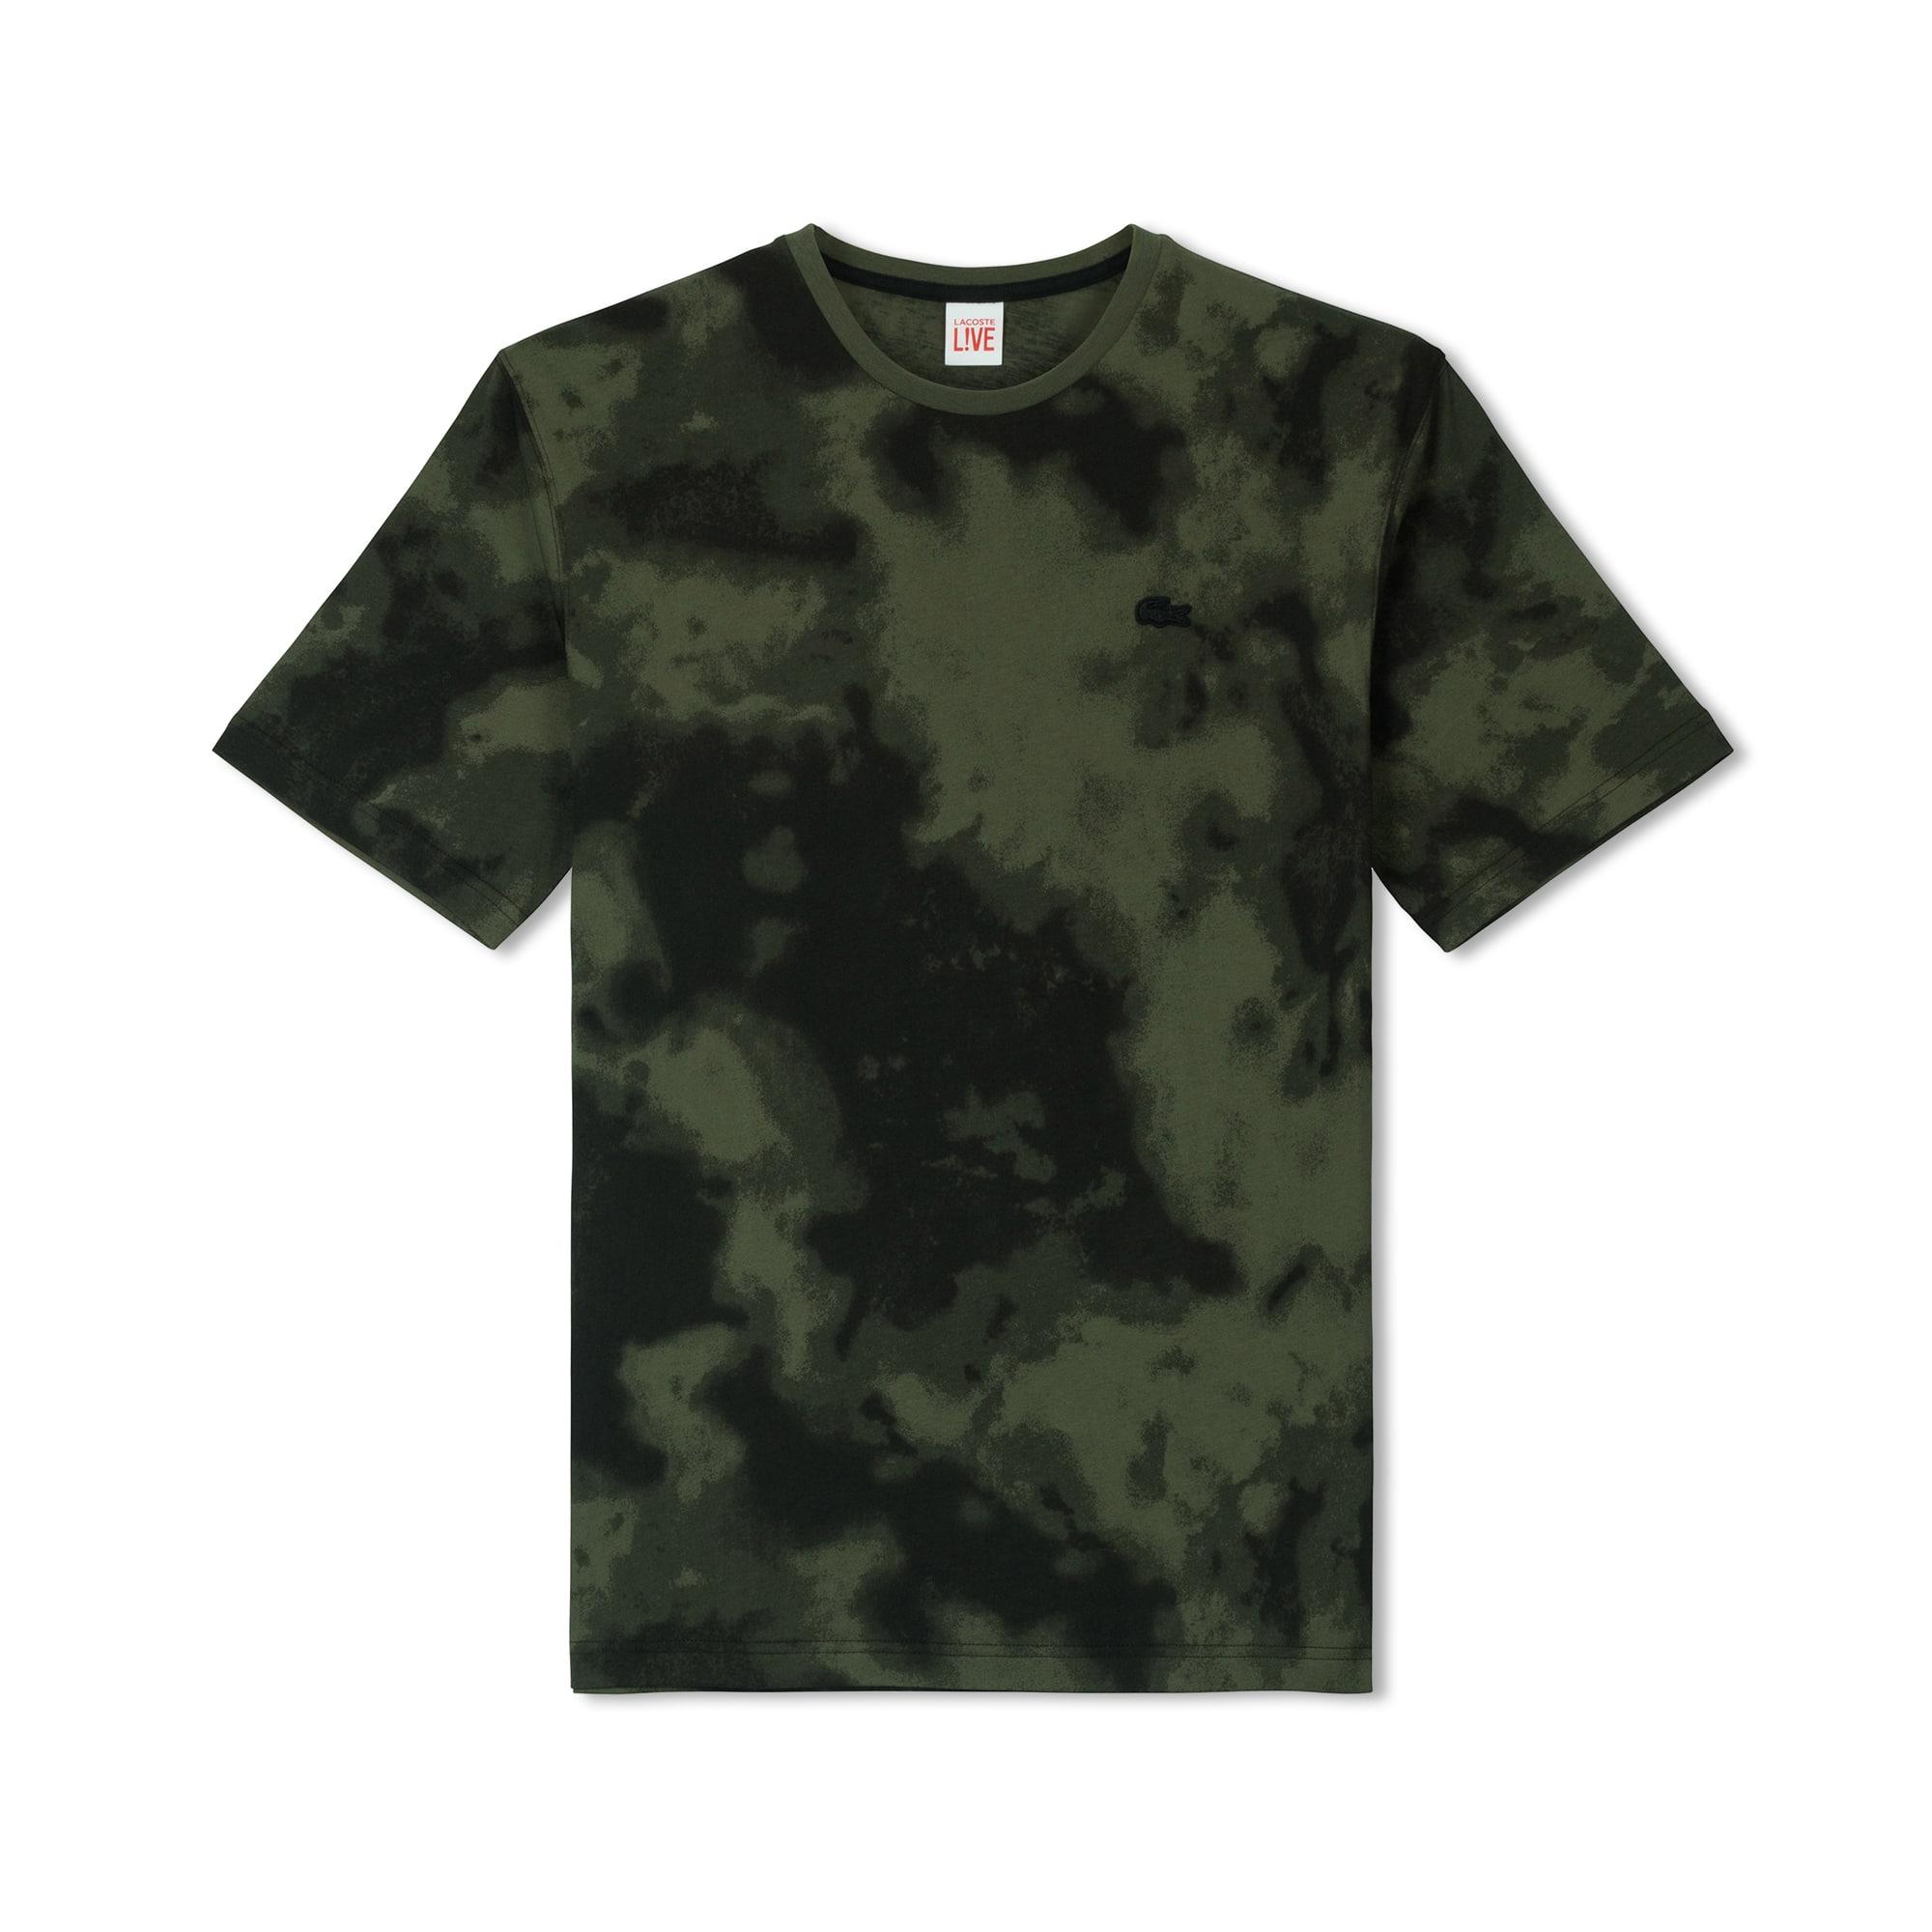 Lacoste LIVE系列云朵印花弹性平纹针织面料男士圆领T恤